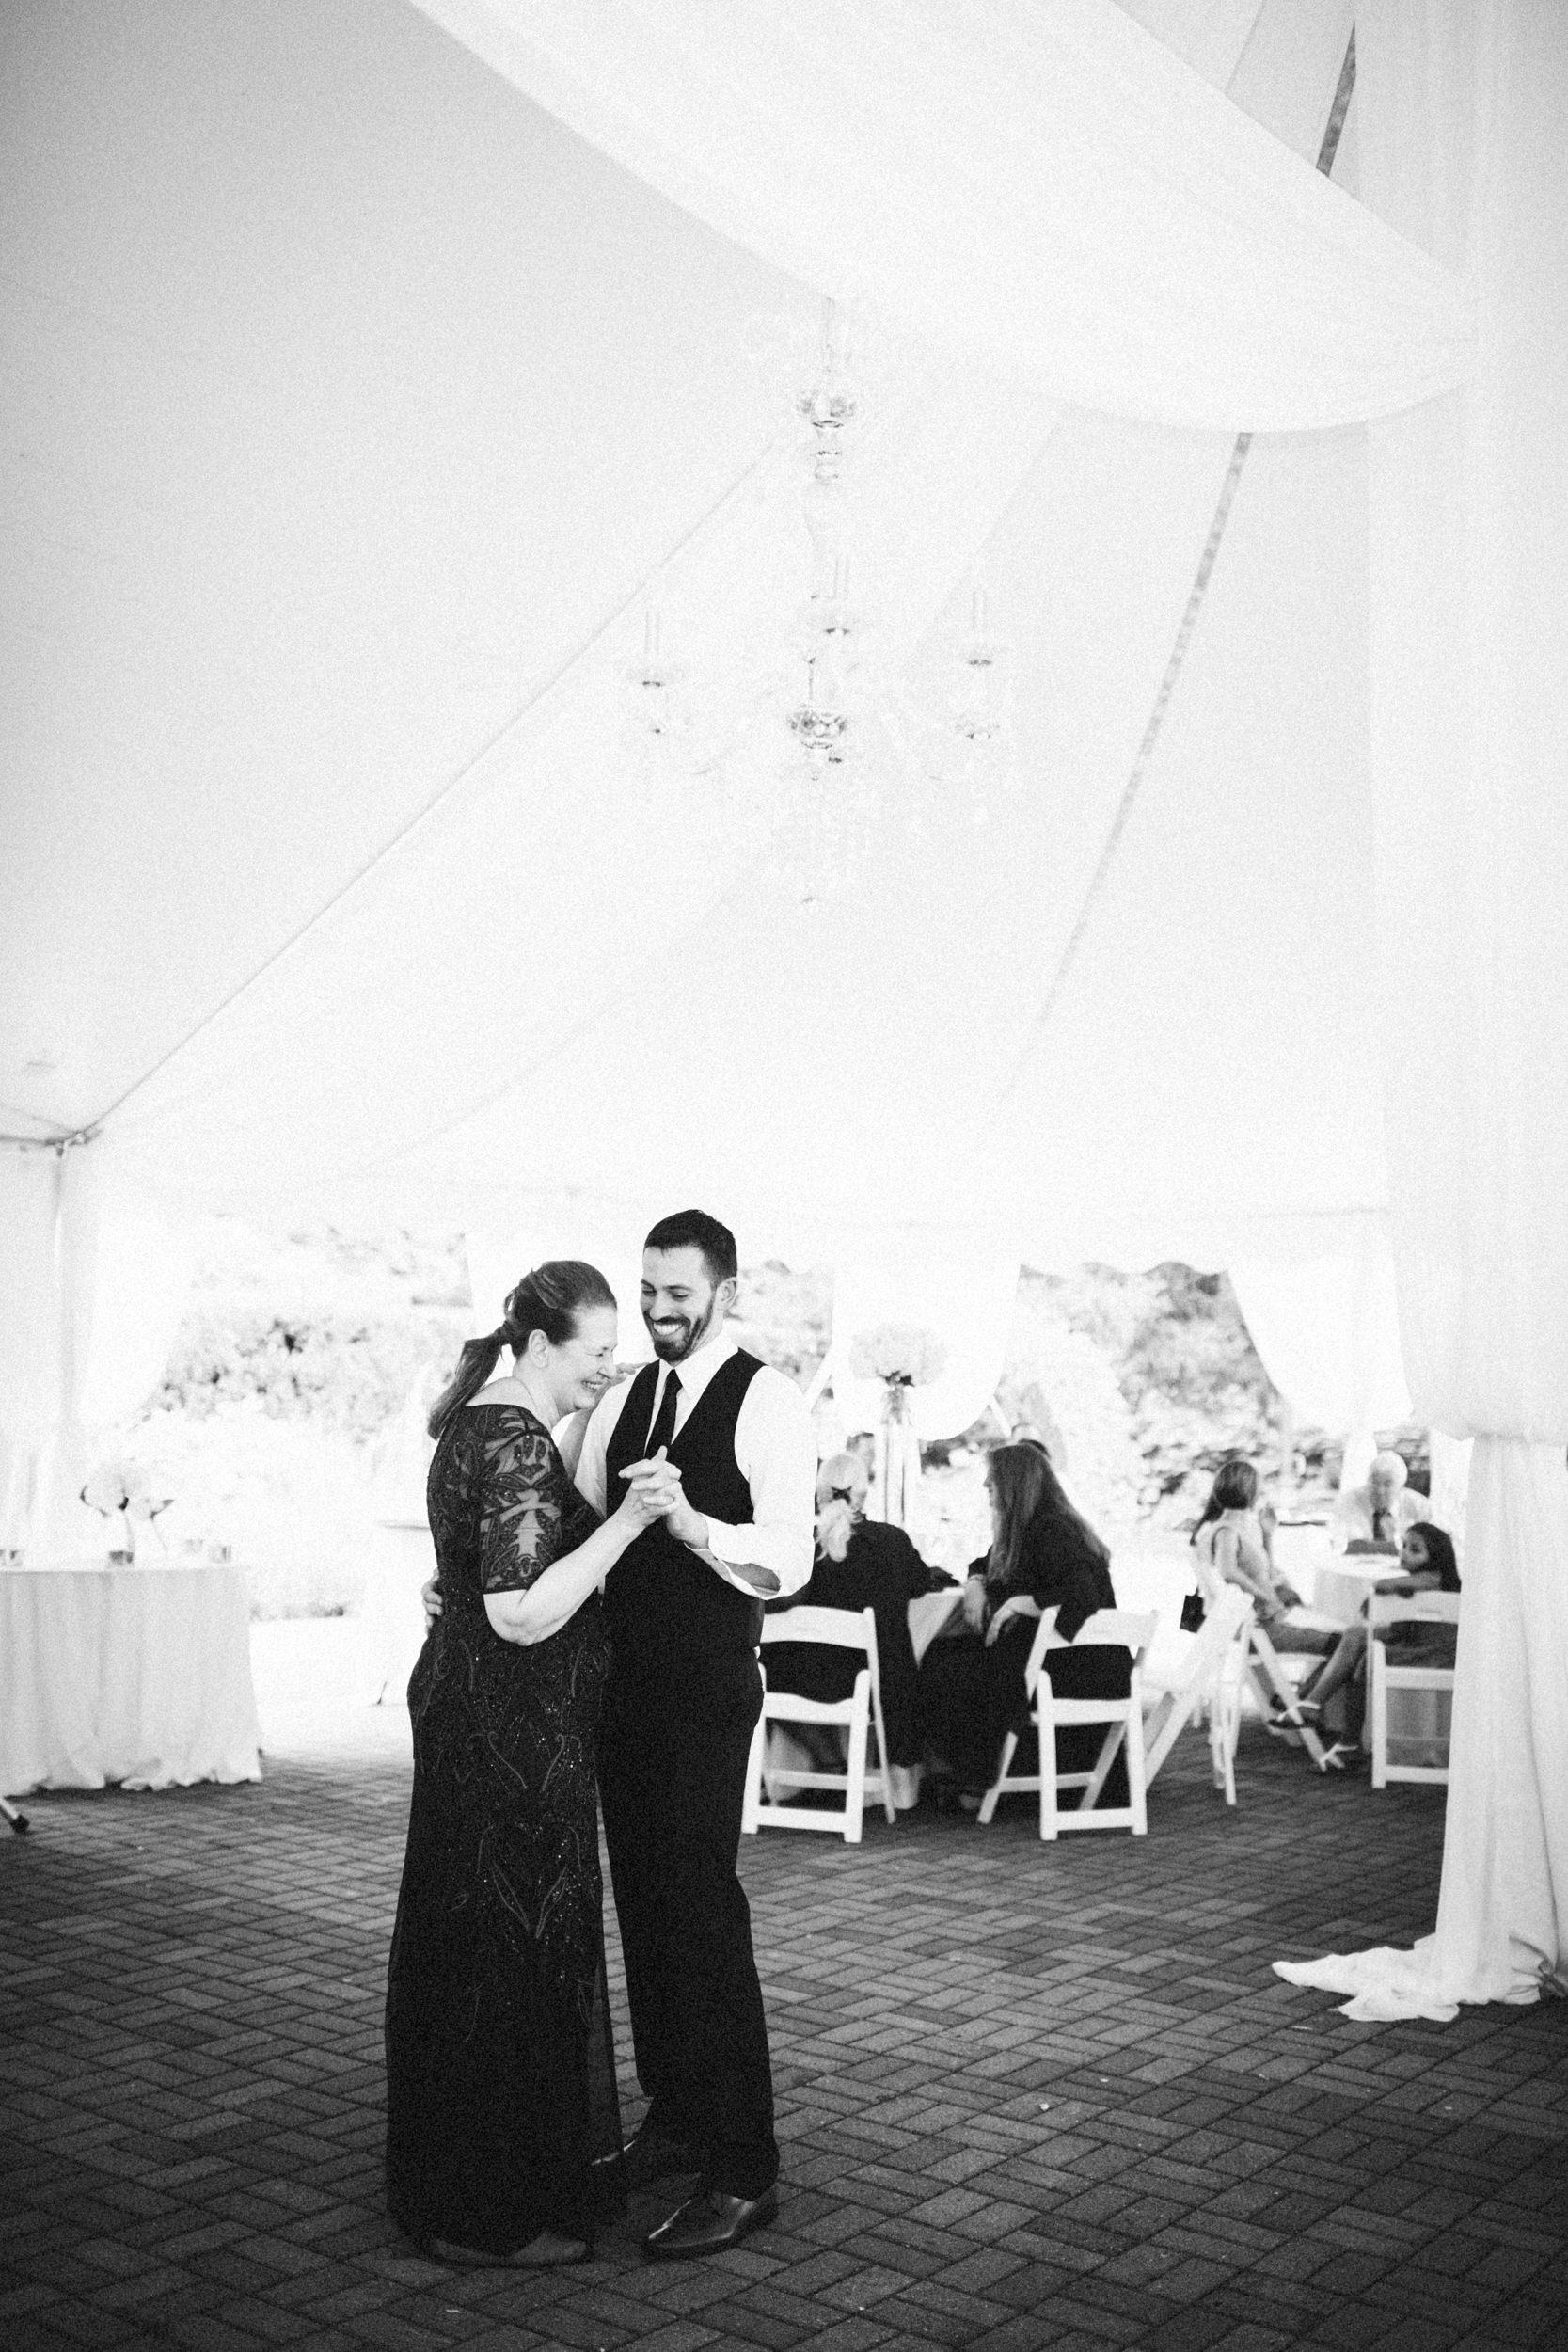 Louisville-Kentucky-Wedding-Elopement-Photographer-Sarah-Katherine-Davis-Photography-Whitehall-Classic-Timeless-Garden-Wedding-702.jpg